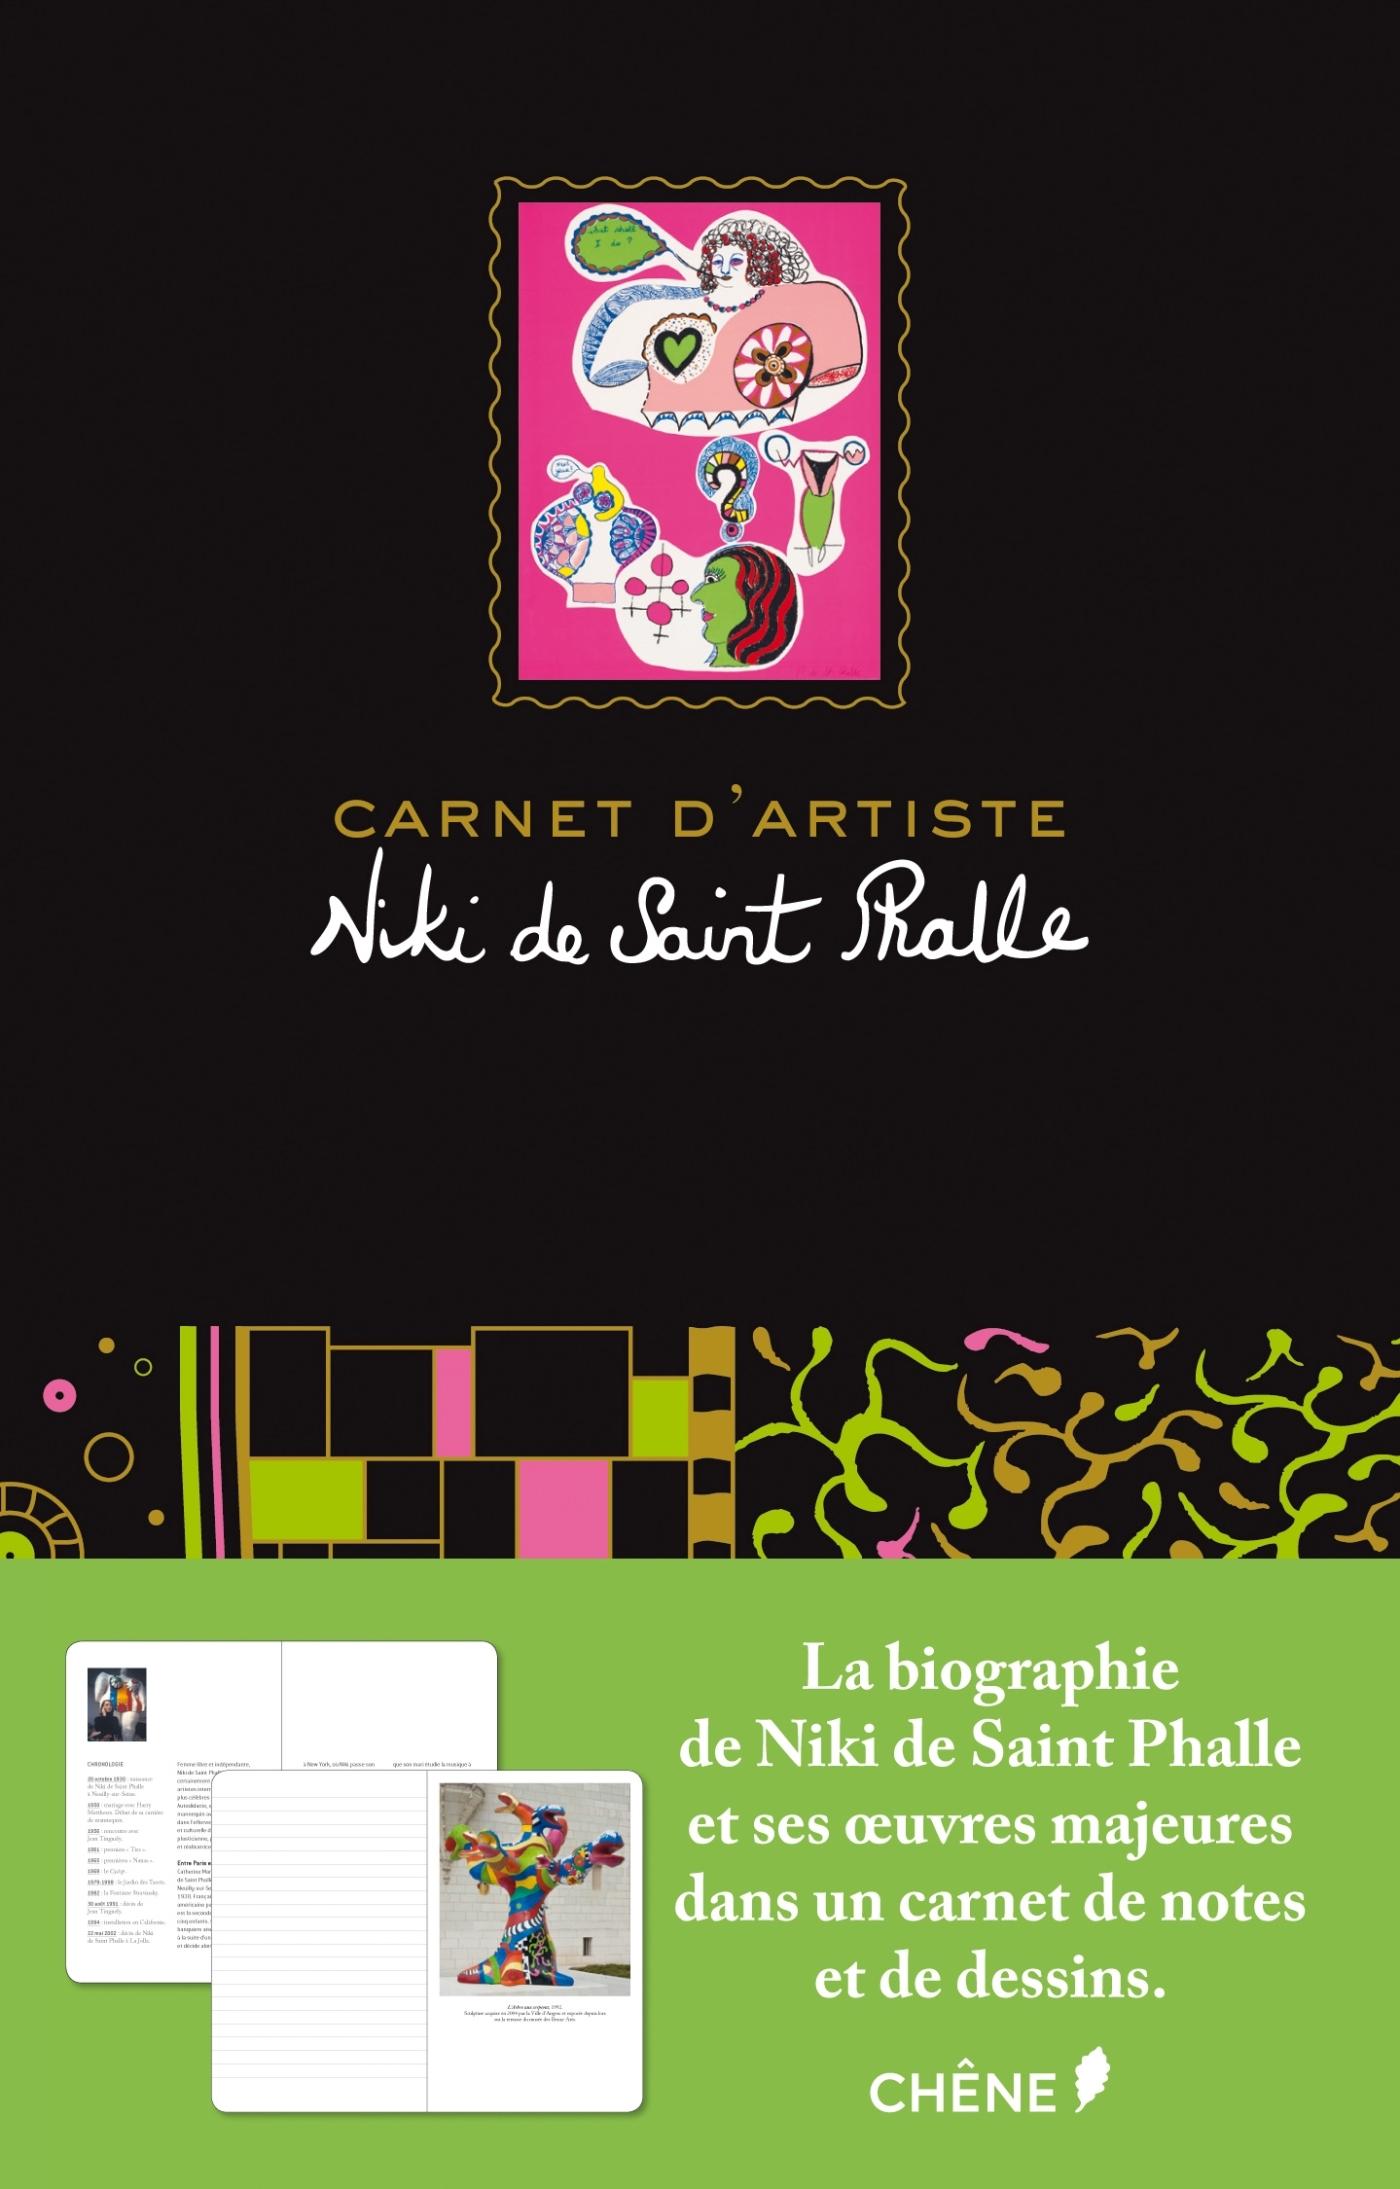 CARNET D'ARTISTES NIKI DE SAINT PHALLE